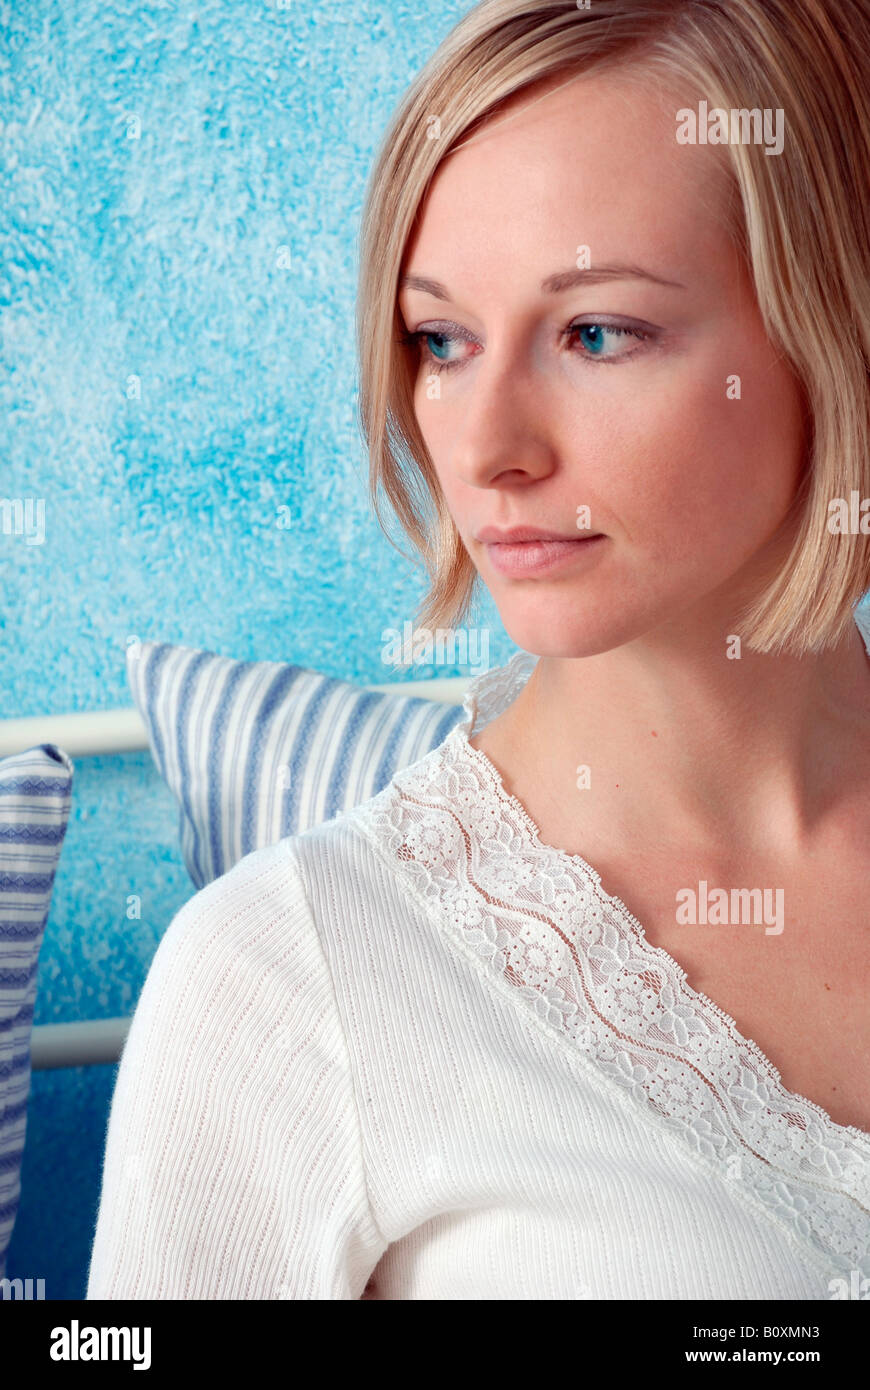 Mujer rubia, Retrato Imagen De Stock